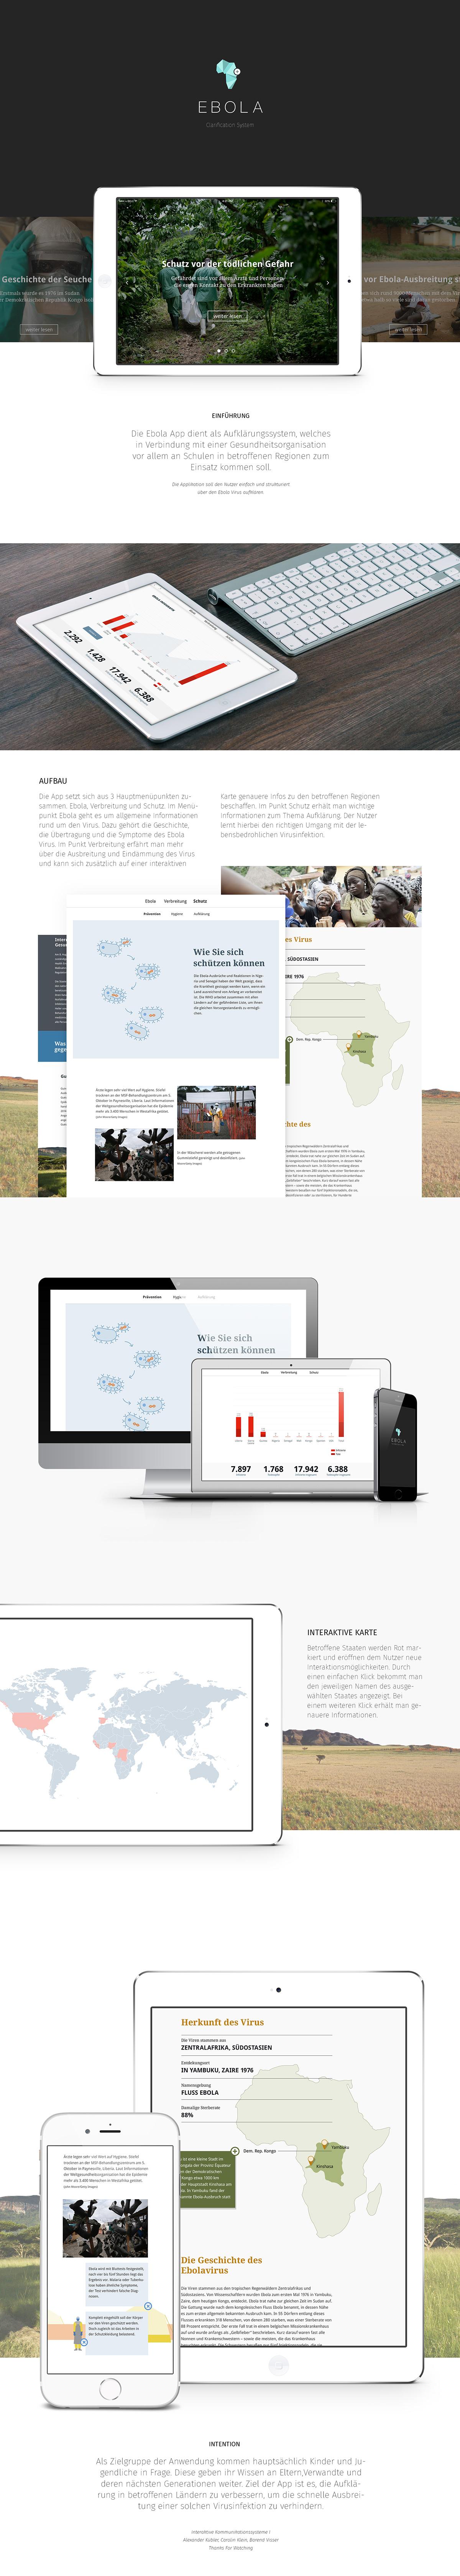 UI app mobile interactive Clarification ebola communication system